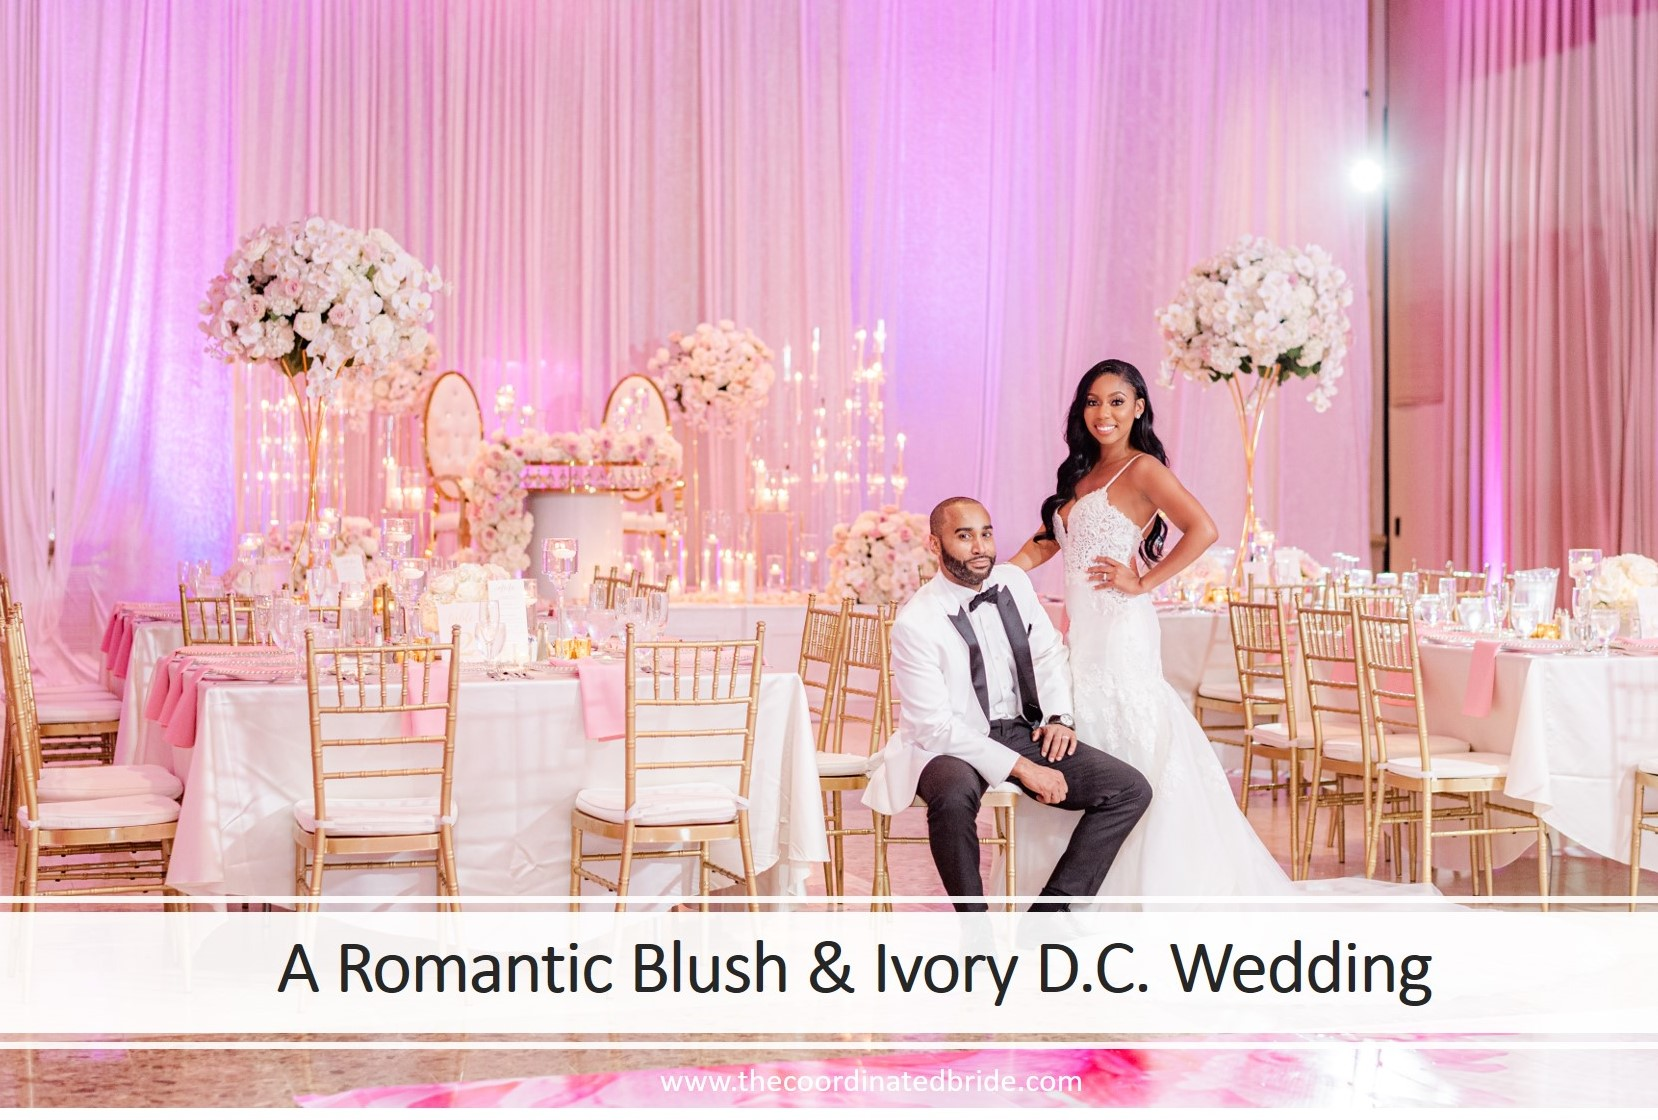 A Romantic Blush & Ivory September Wedding, Jene & Vance